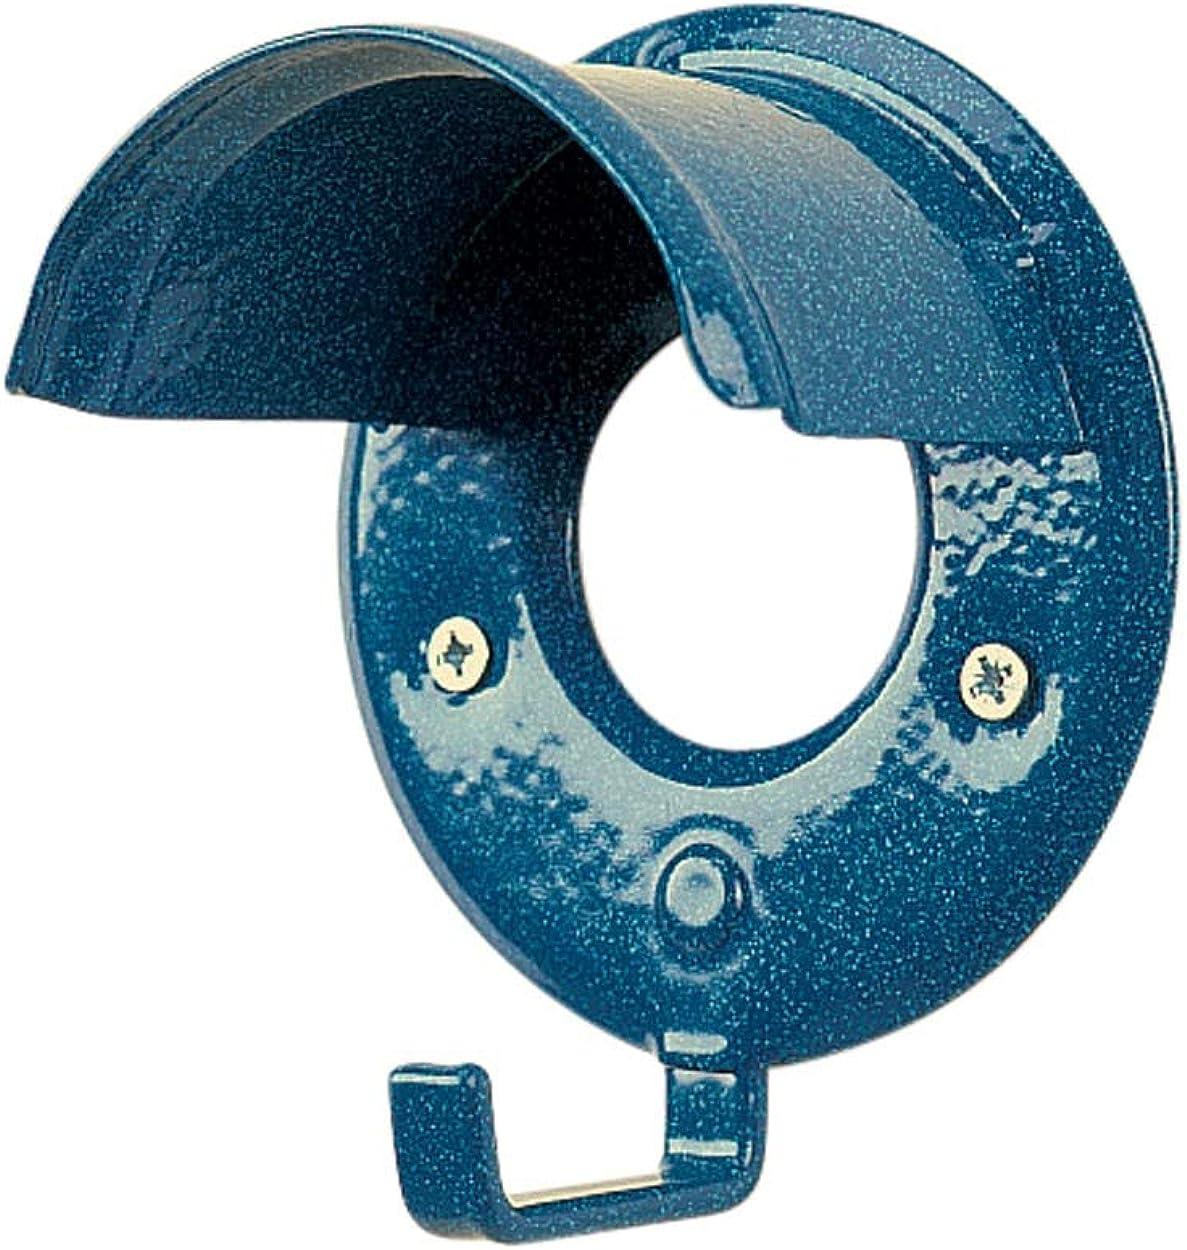 Stubbs Bridle Rack S20 Single 40% Store OFF Cheap Sale